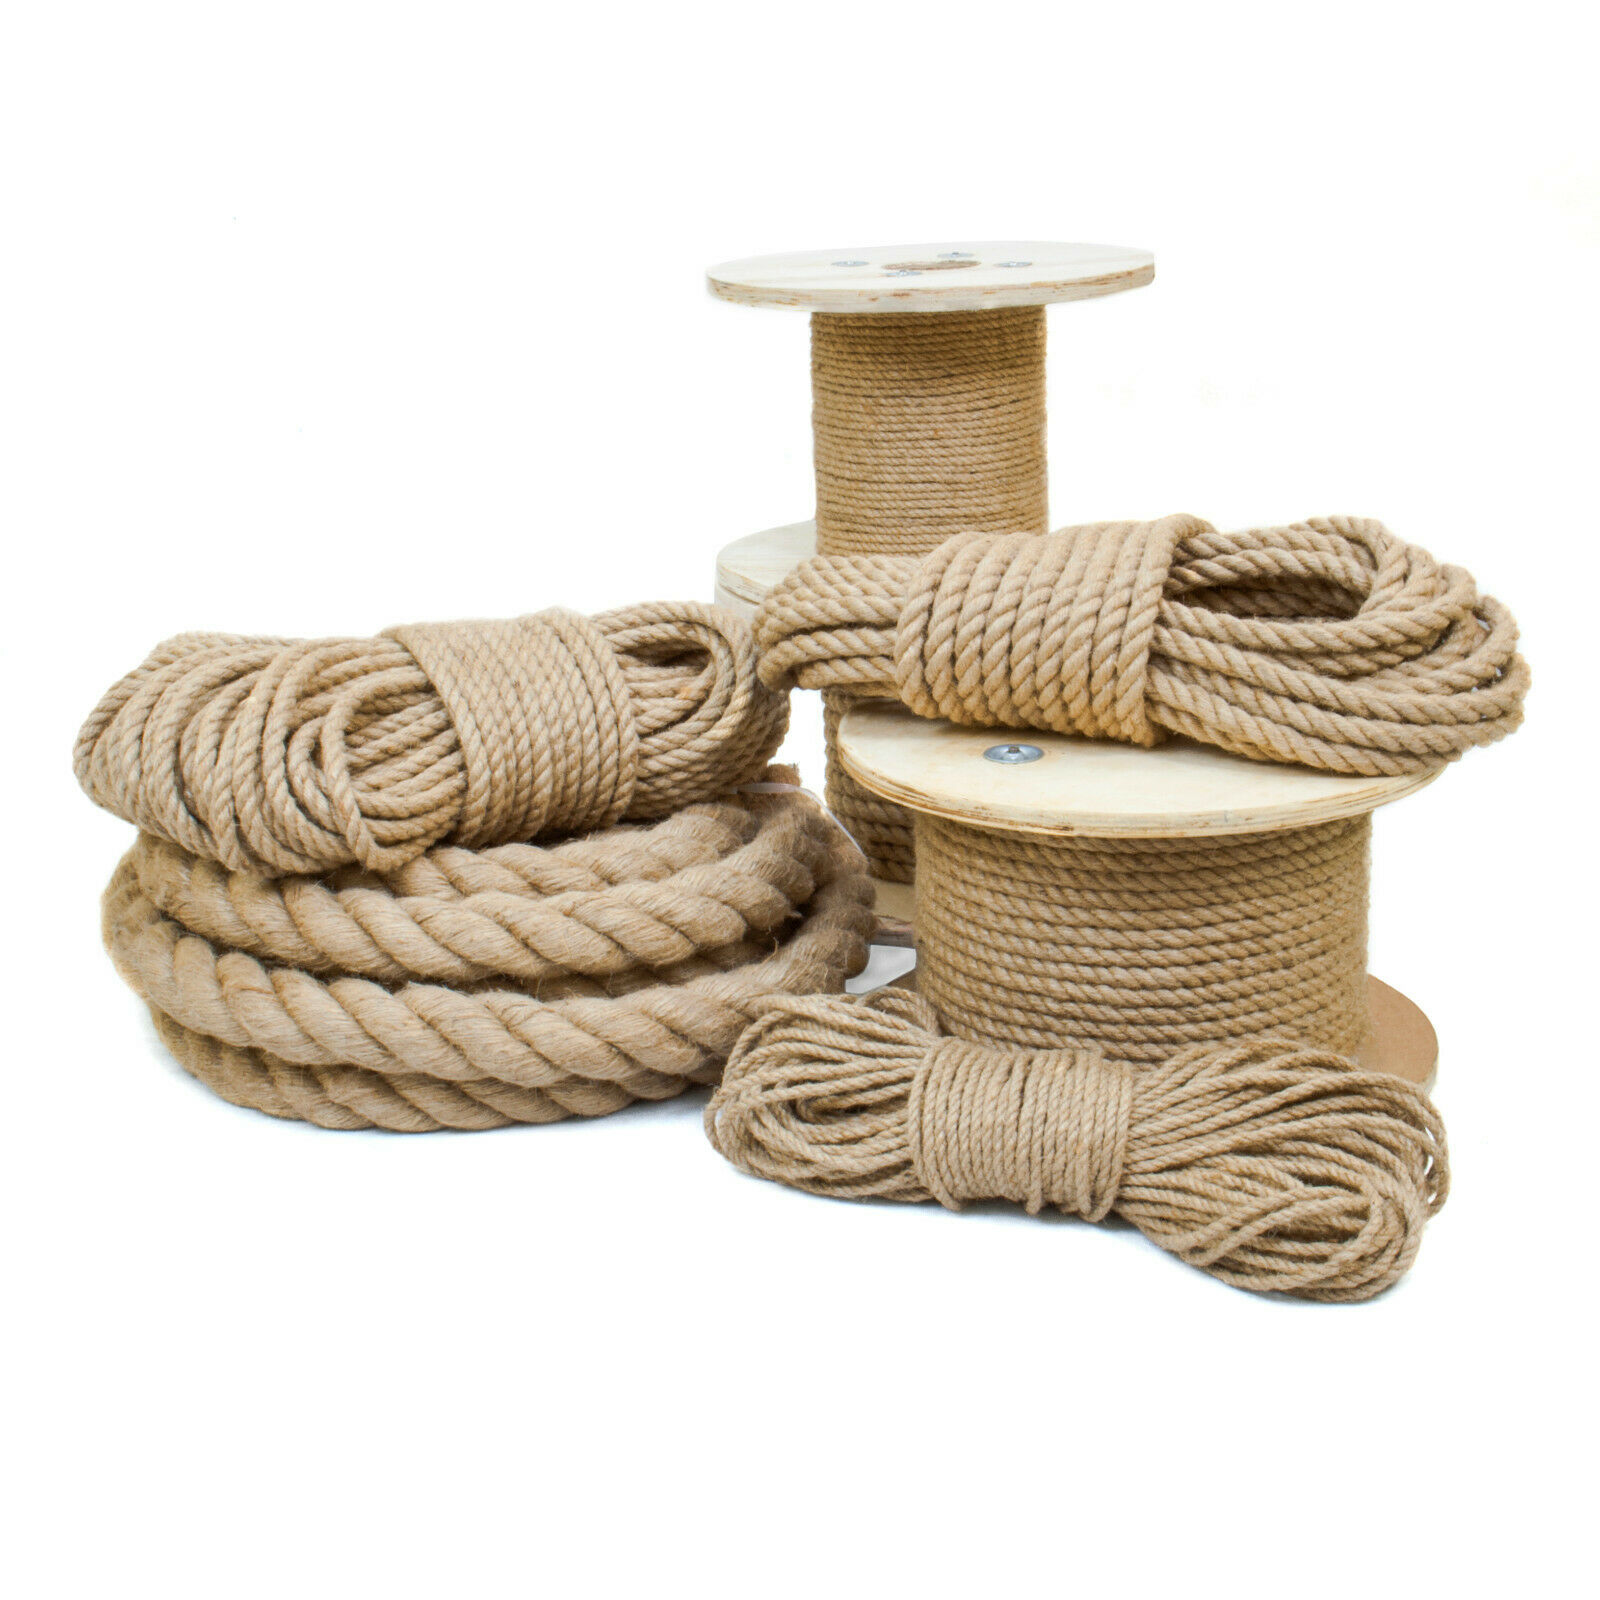 JUTESEIL 6 - 60 mm Dickes Tau Seil Kordel Natur Maritime Dekoration Jute Schnur